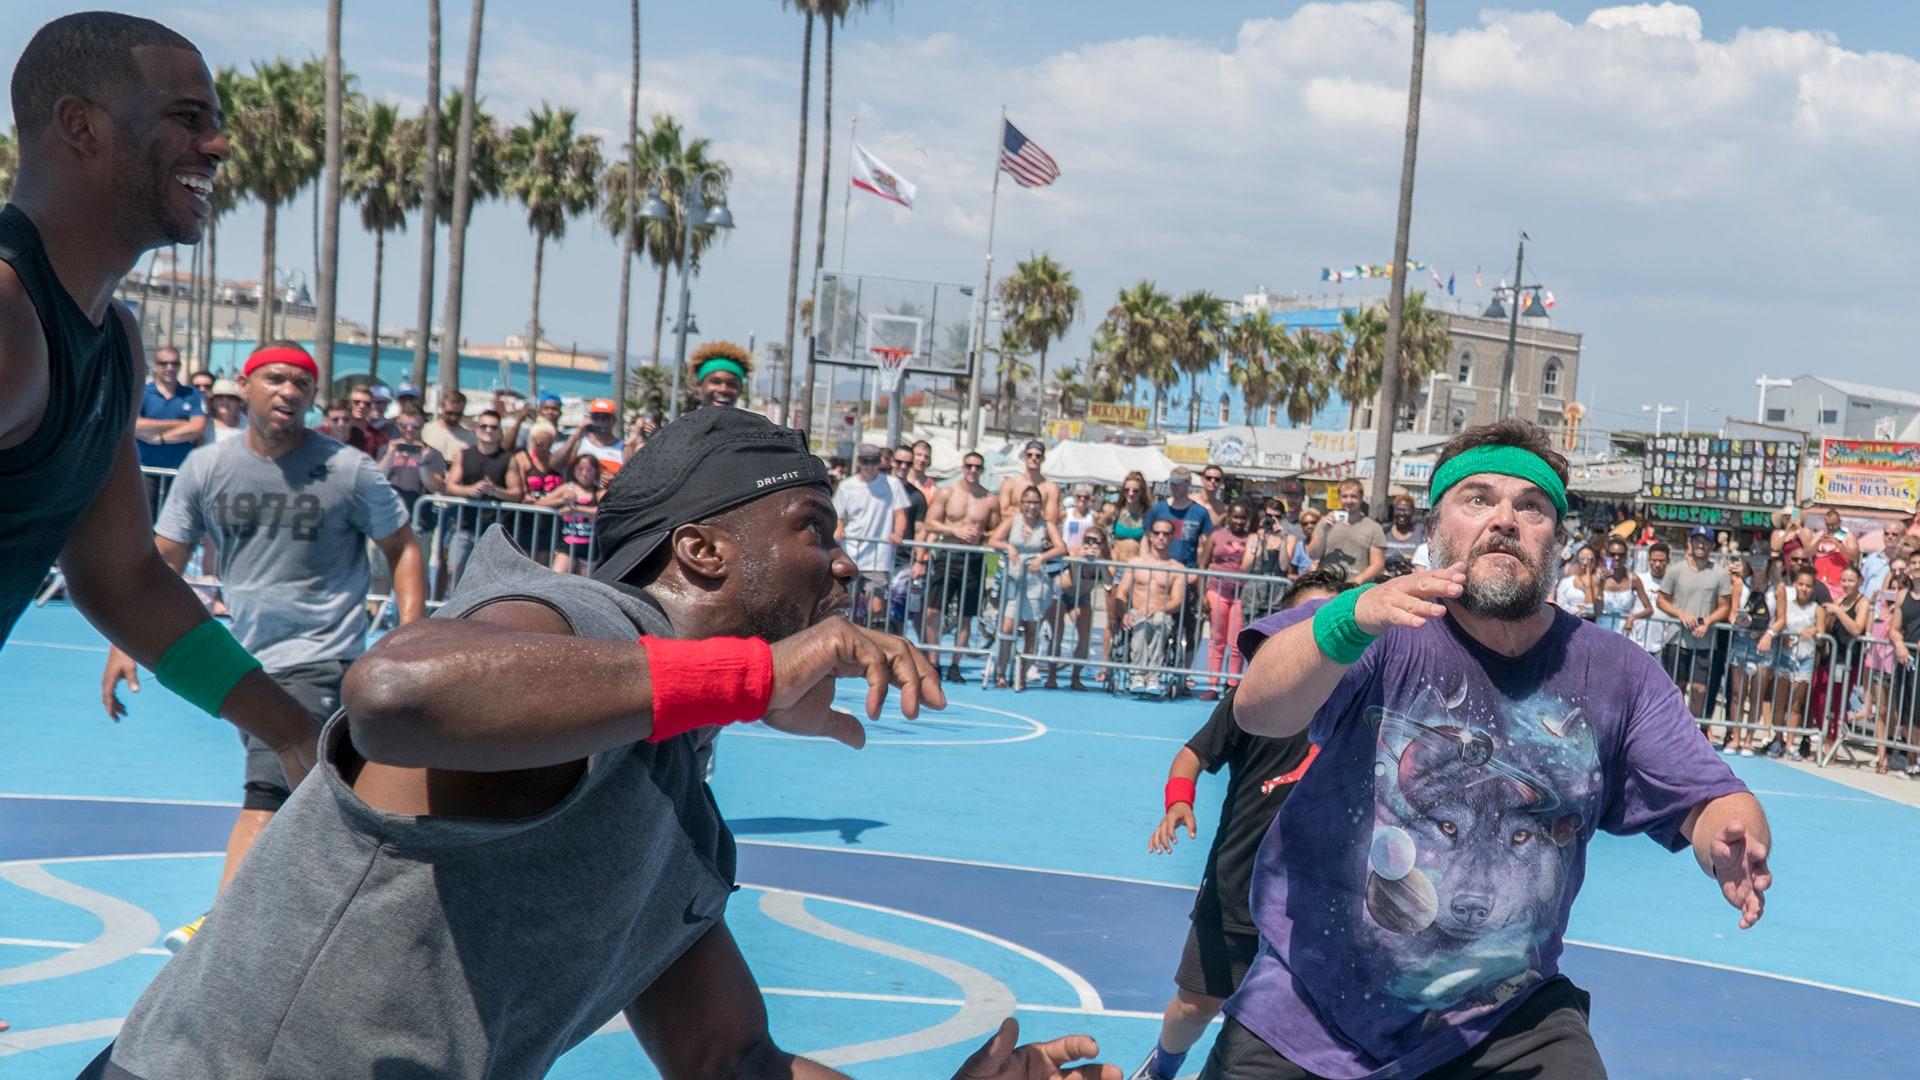 Basketball with Jack Black and Chris Paul